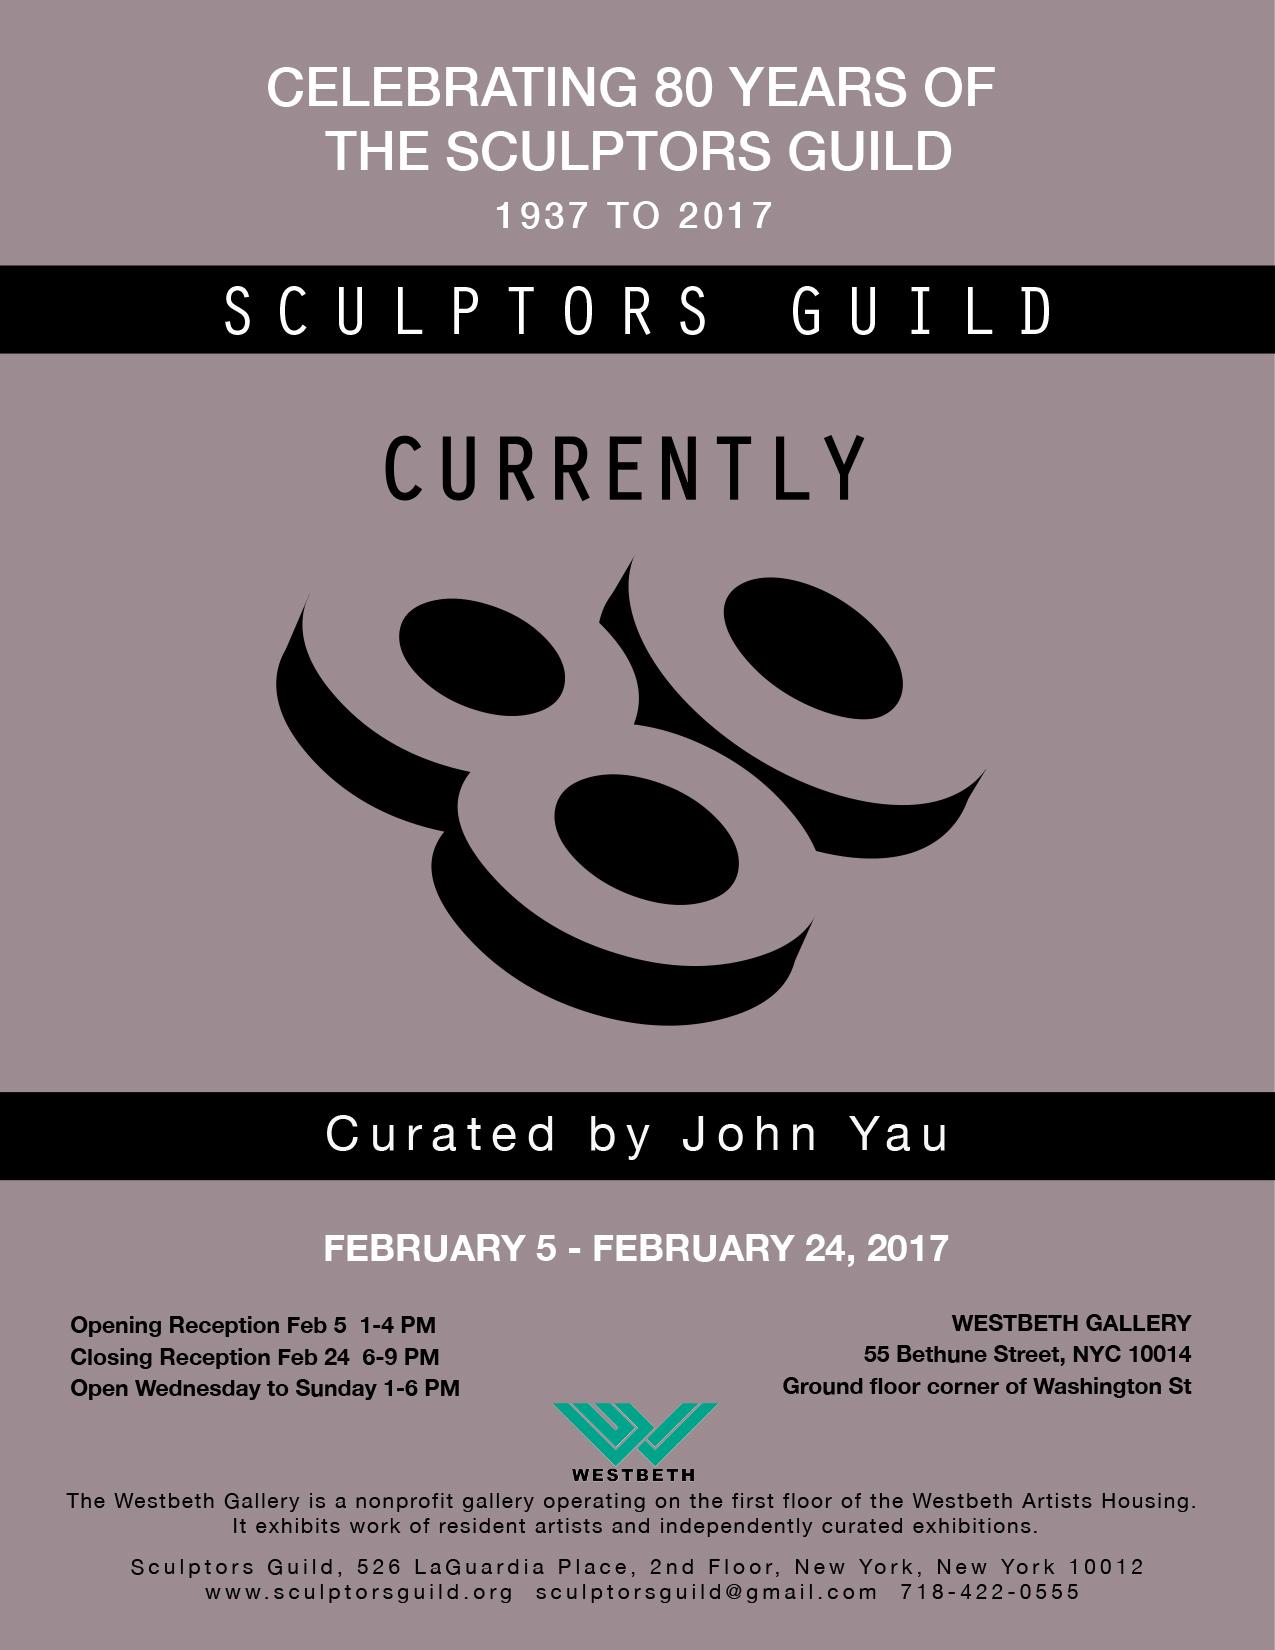 Currently80 Sculptors Guild